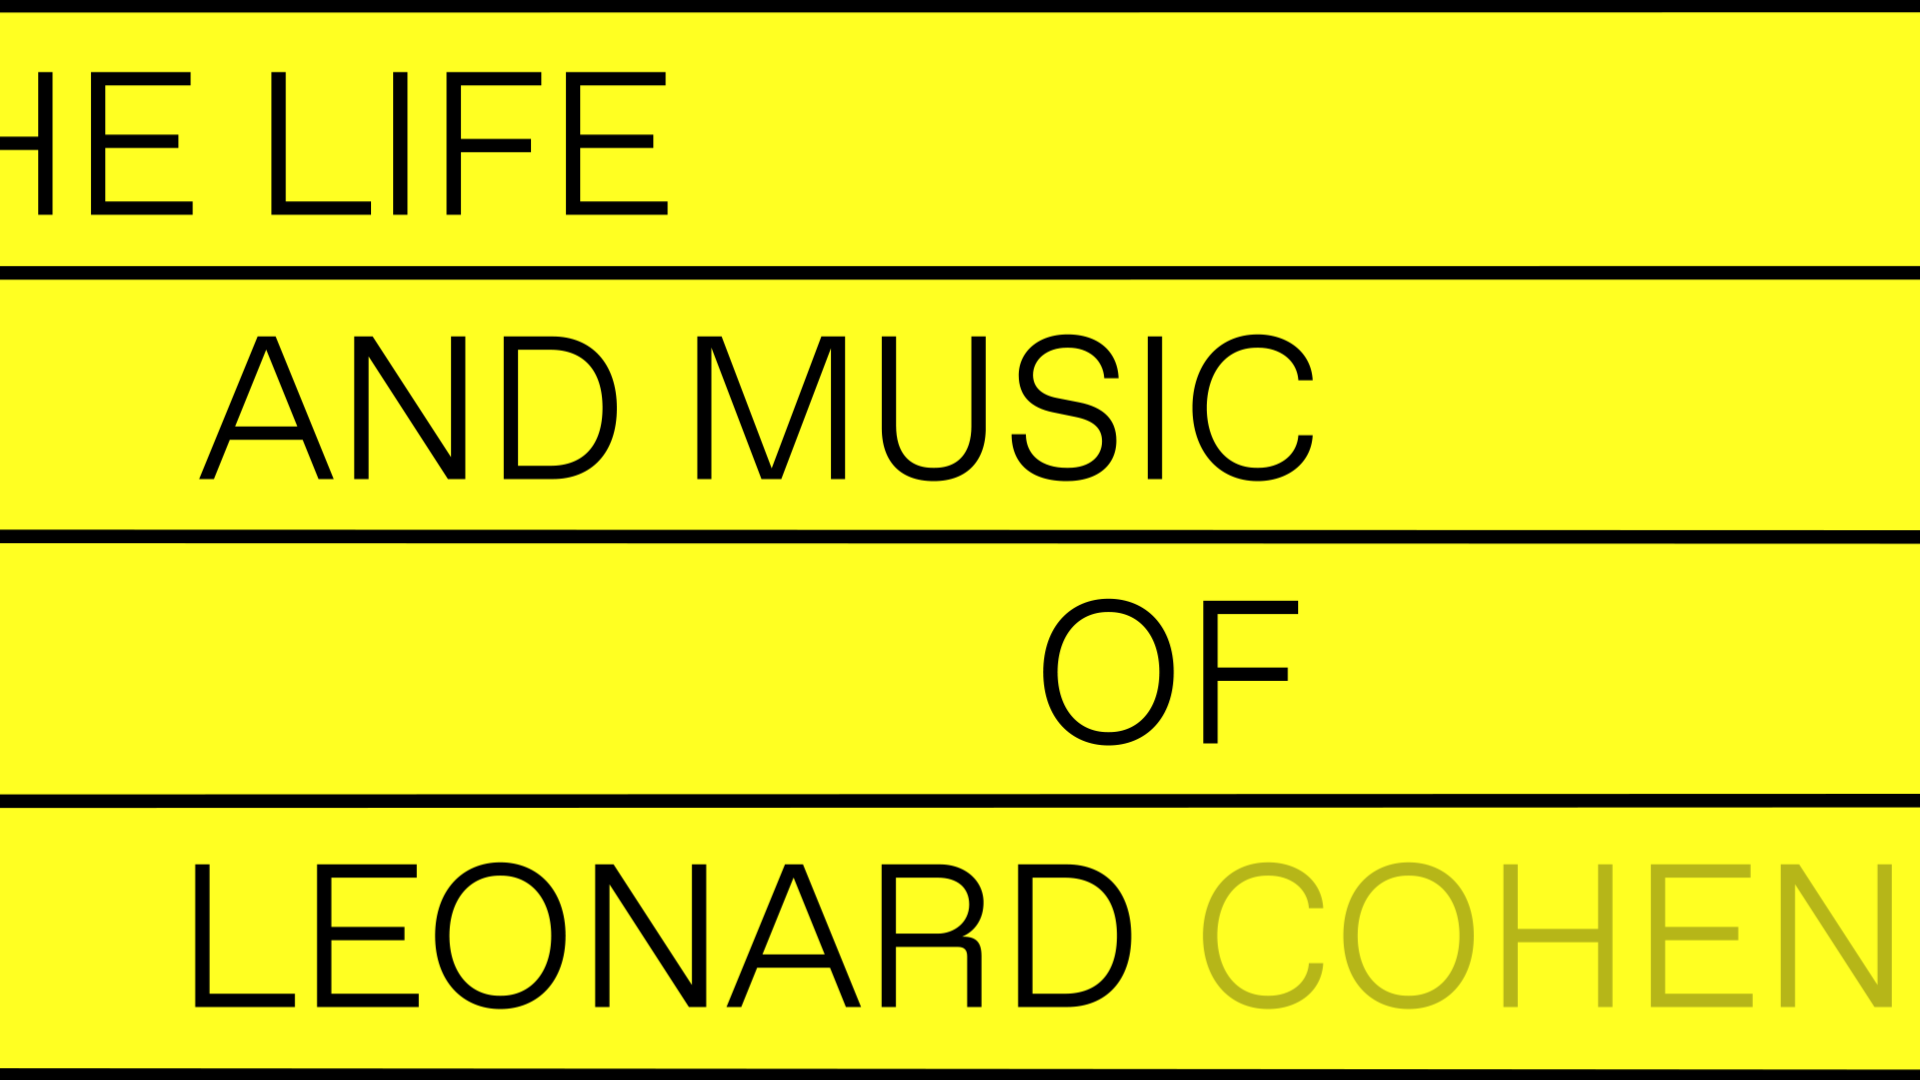 JM_CZimmerman_Leonard-Cohen_5